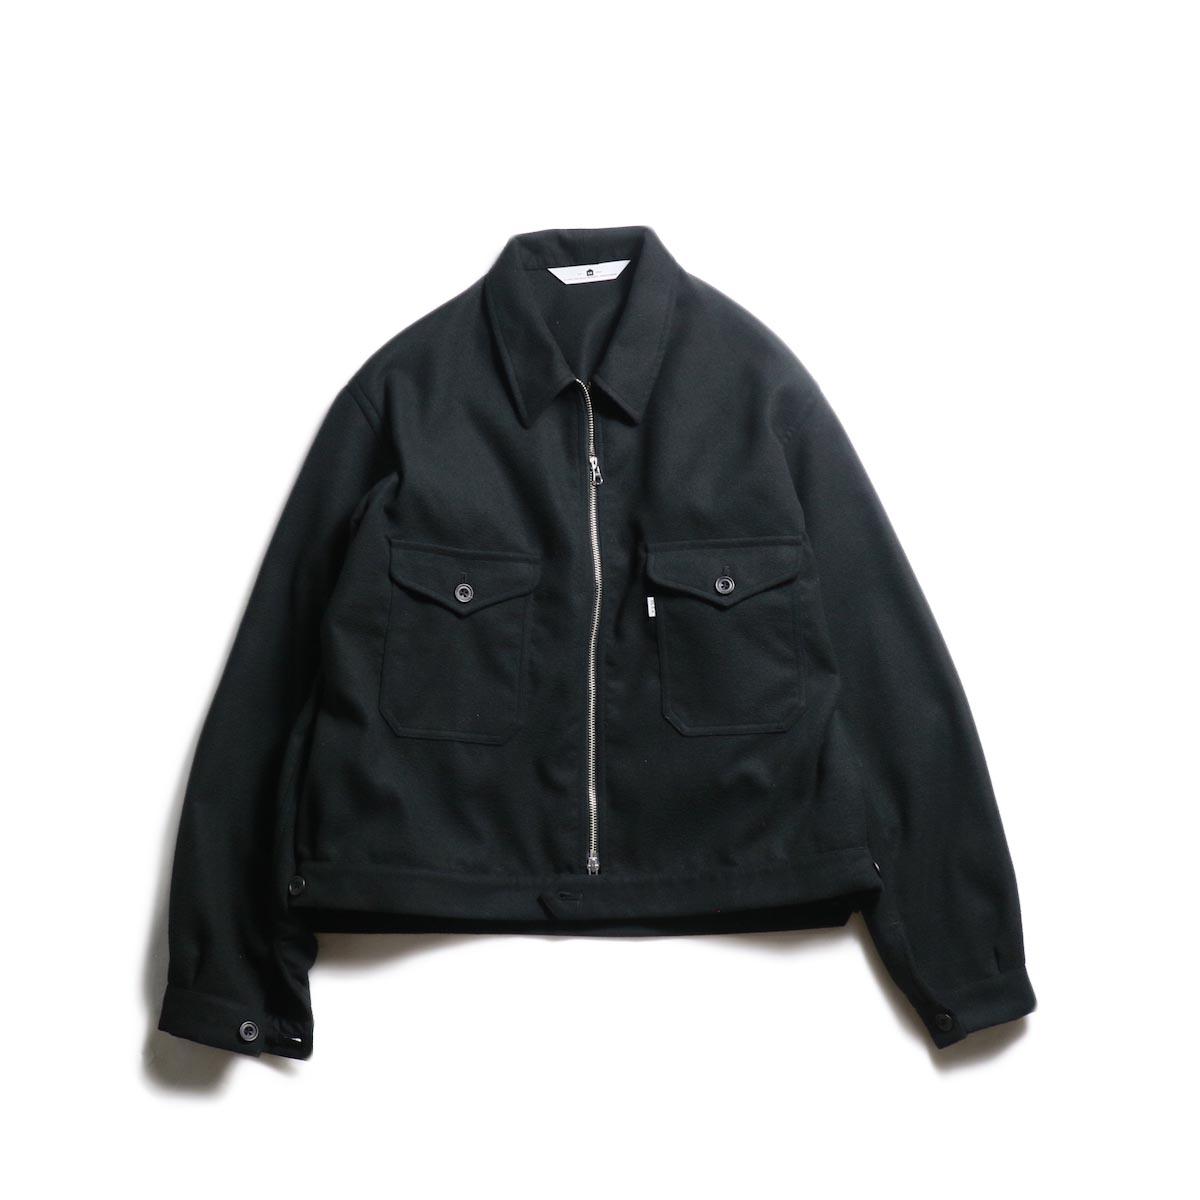 SGGM / Worker Zip Blouson (Black)